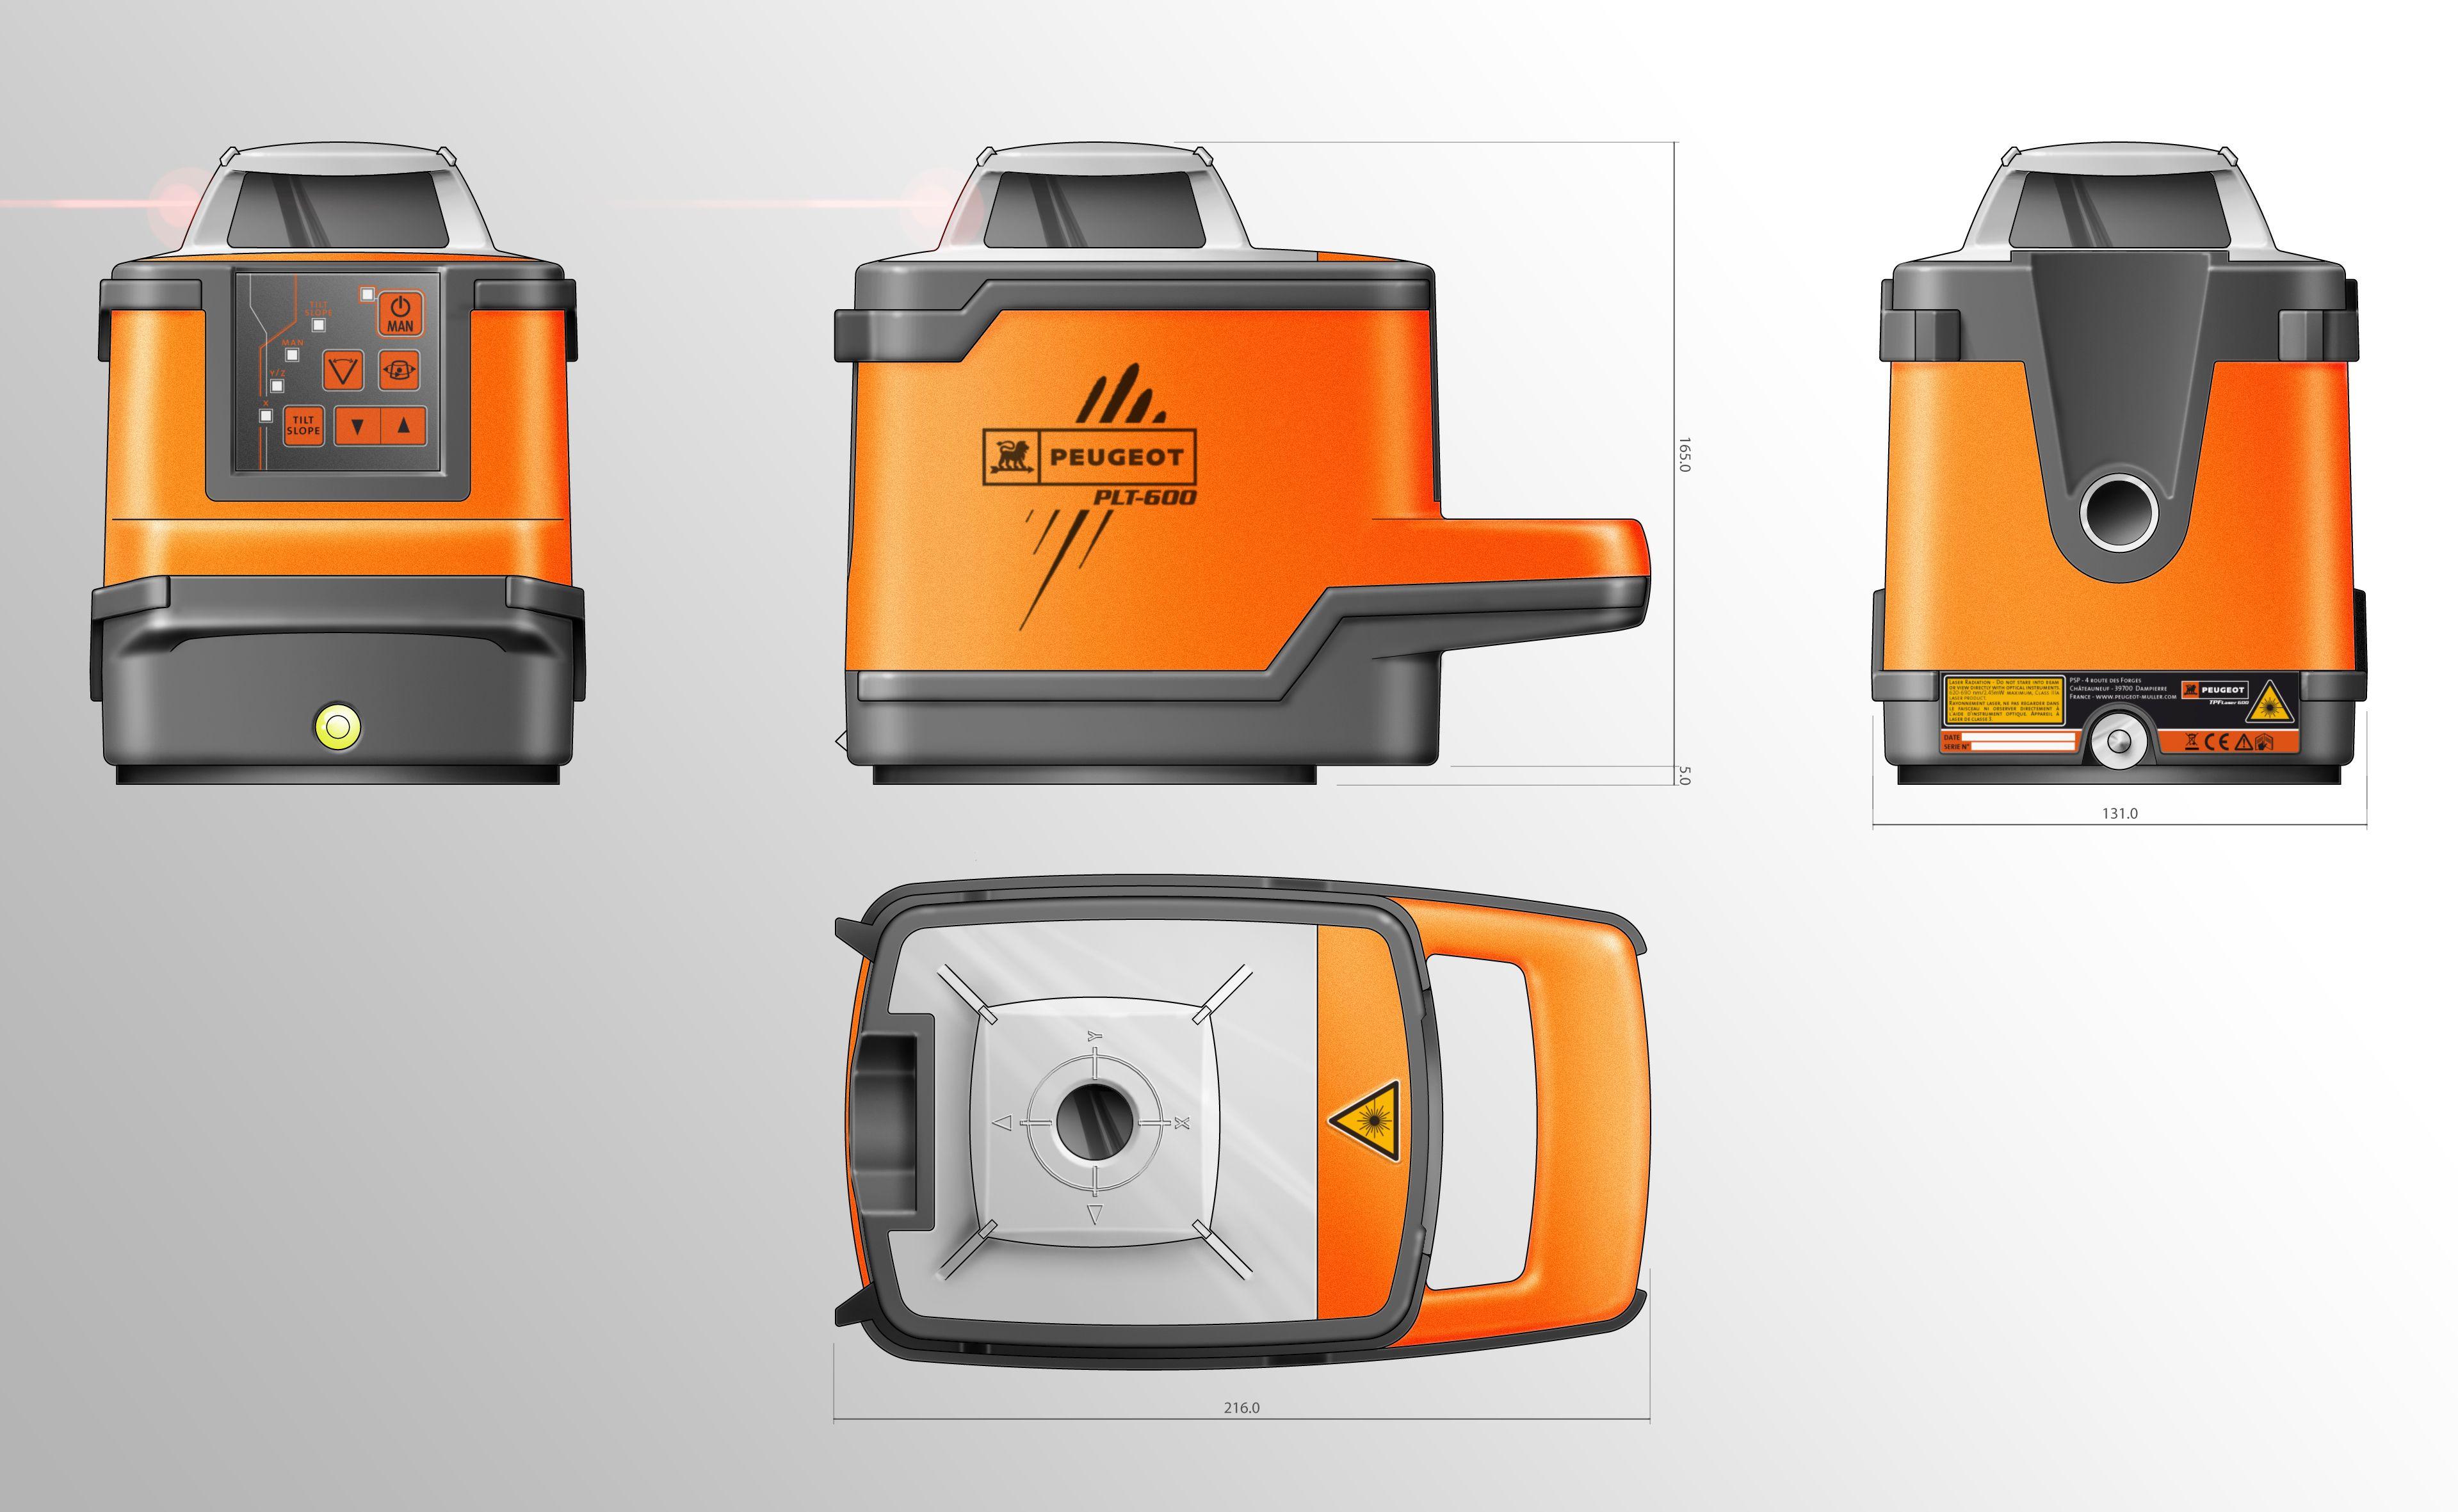 Related image industrial design pinterest peugeot for Online rendering tool